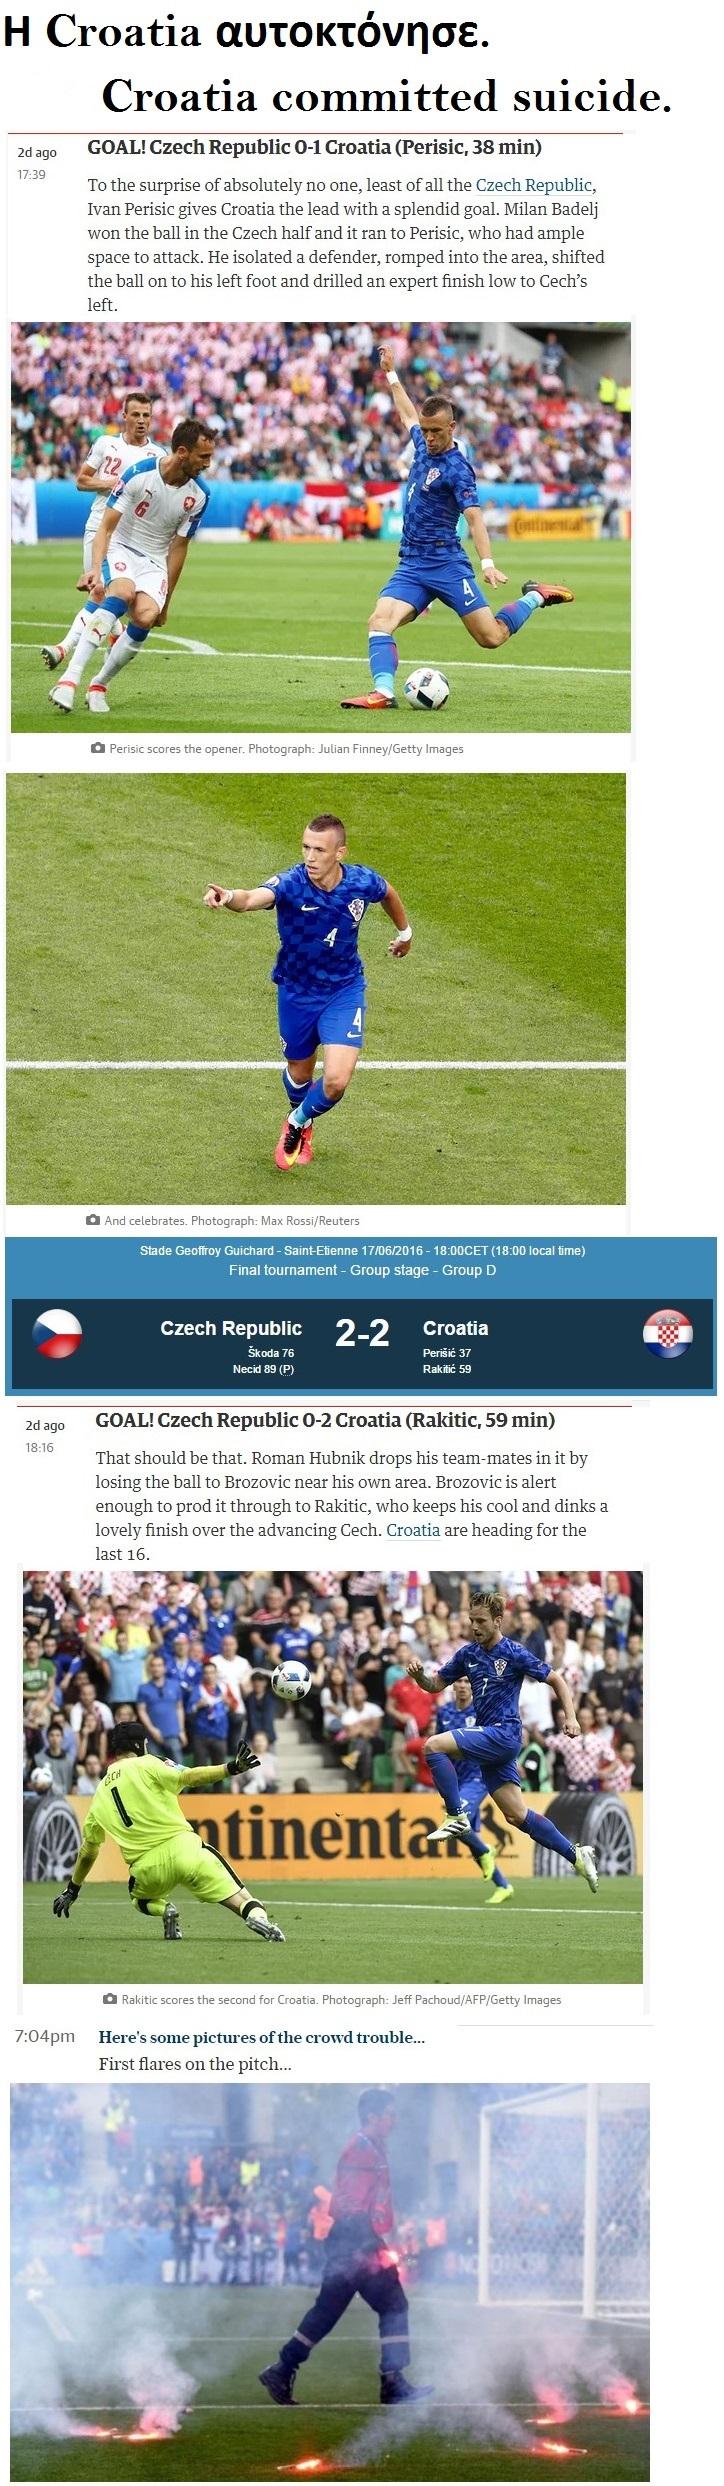 FOOTBALL EURO2016 CHECH REPUBLIC VS CROATIA DRAW 01 200616